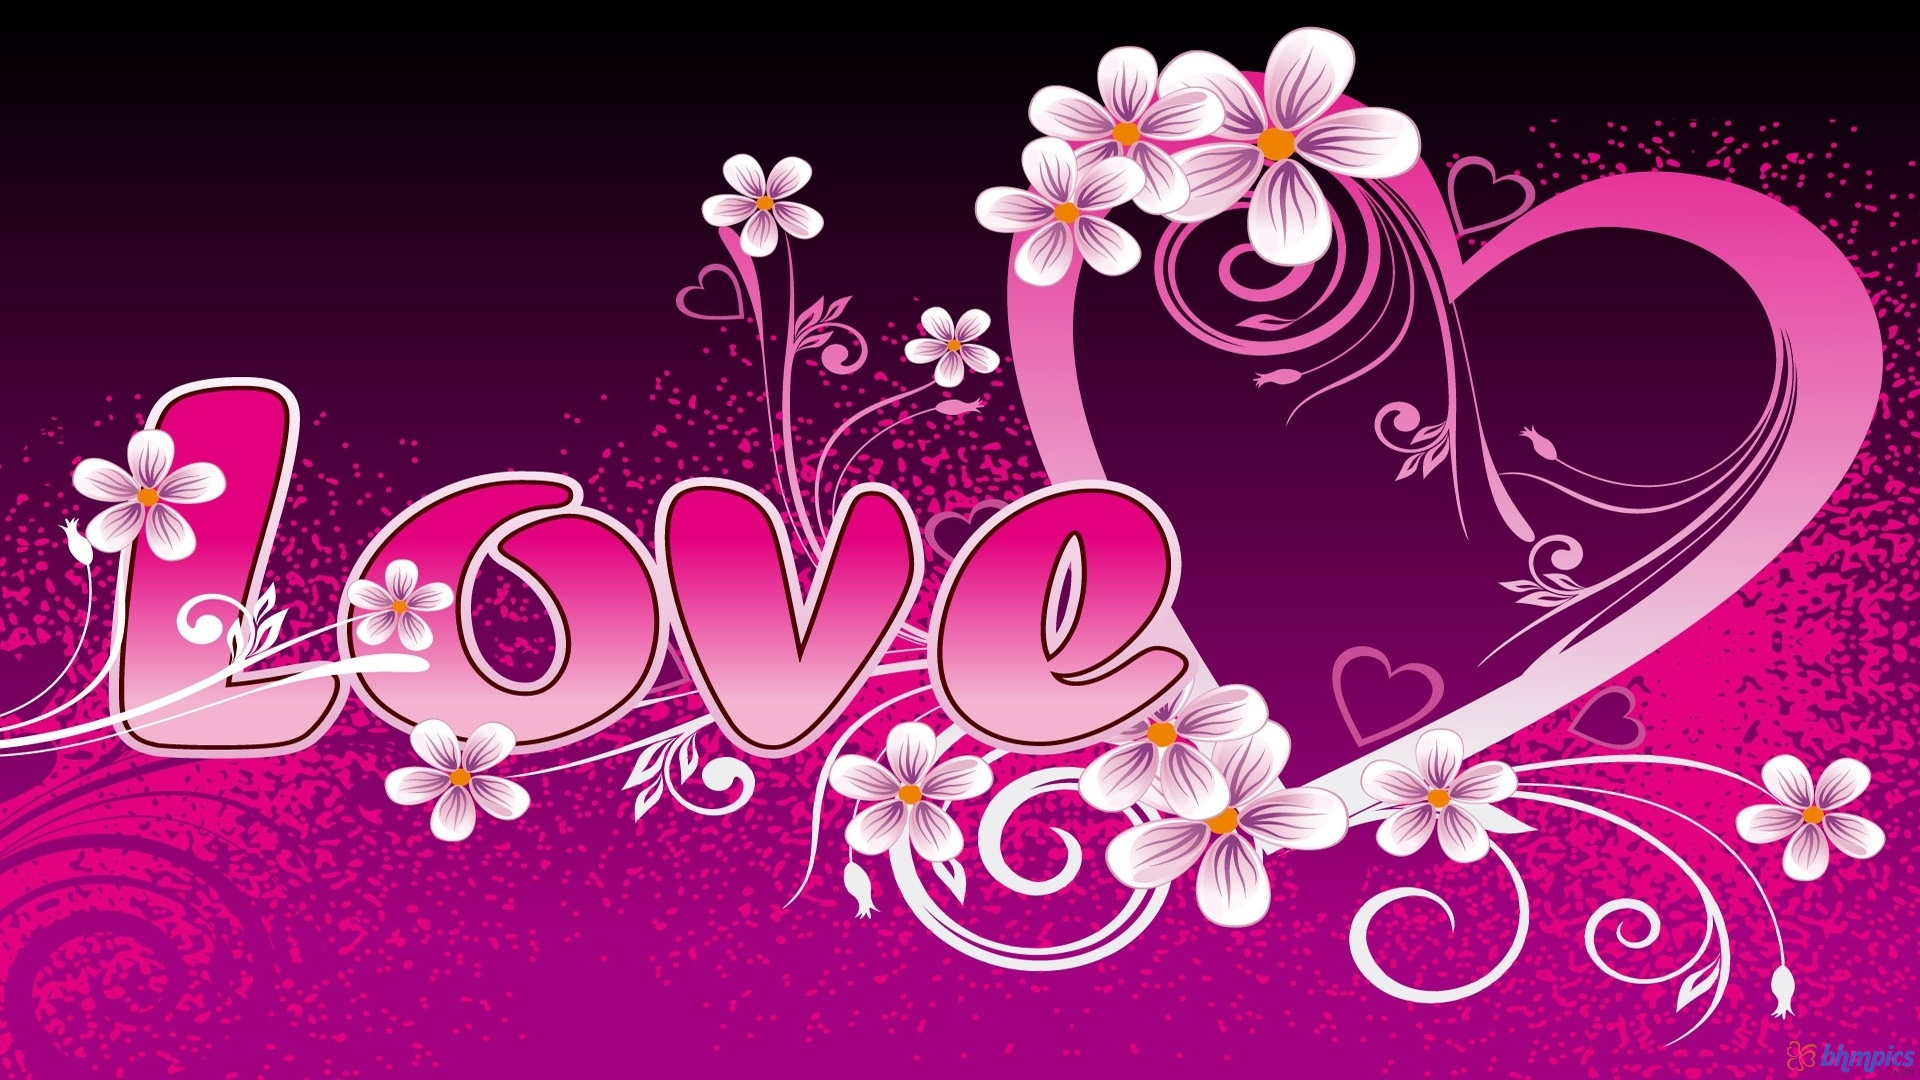 True Love wallpaper 228401 1920x1080